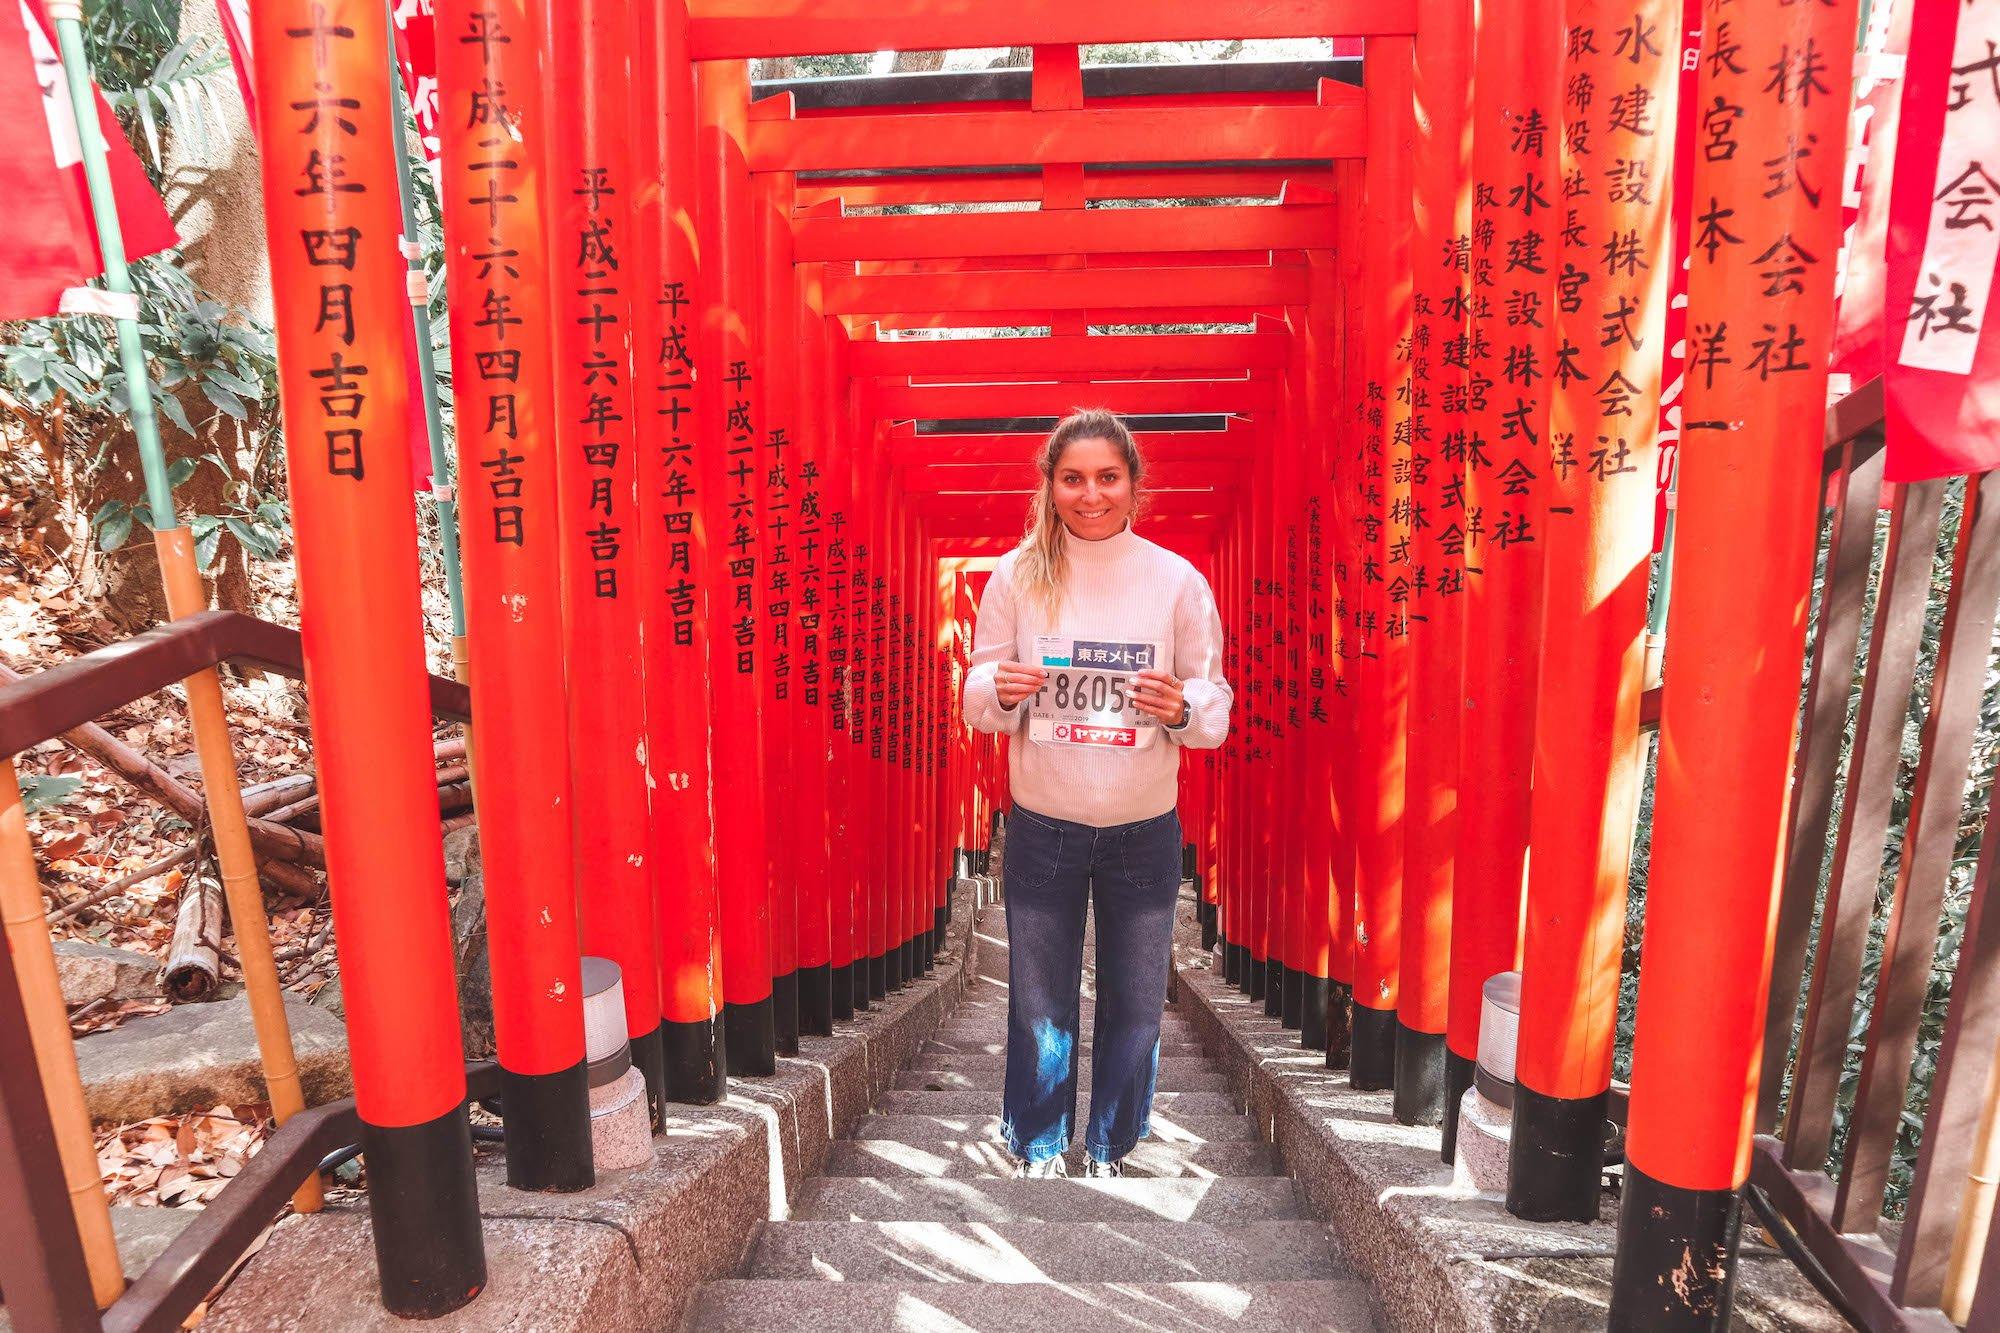 Compte-rendu: Marathon de Tokyo 2019